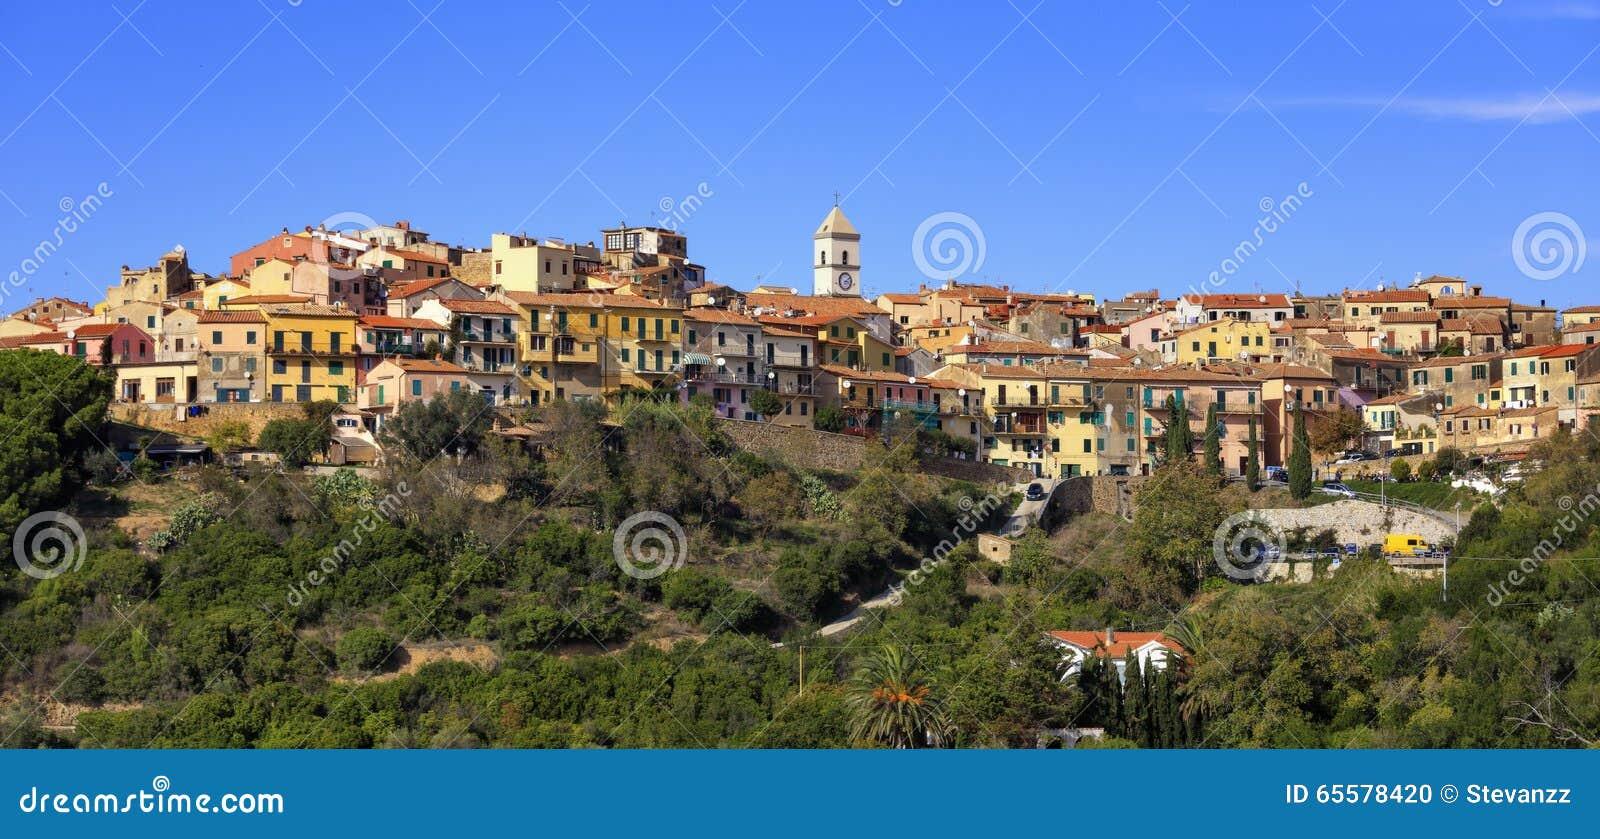 Ilha da Ilha de Elba, panorama da vila de Capoliveri Toscânia Italy